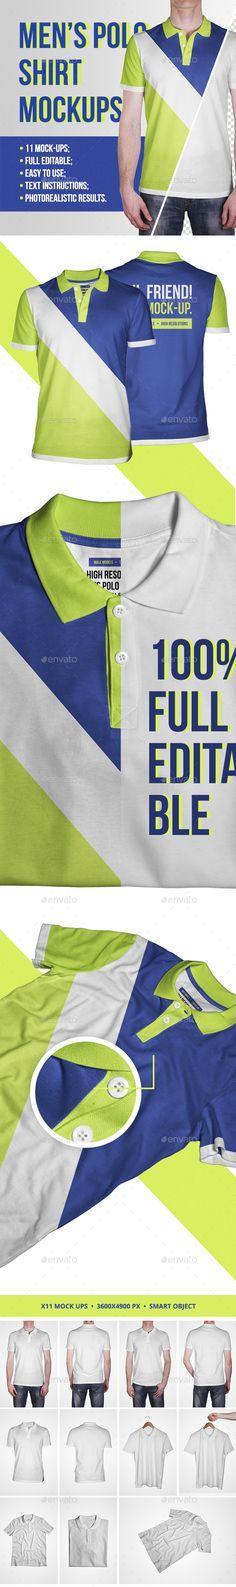 Men's Polo Shirt #Mockups - #T-shirts Apparel Download here:  https://graphicriver.net/item/mens-polo-shirt-mockups/20035312?ref=alena994